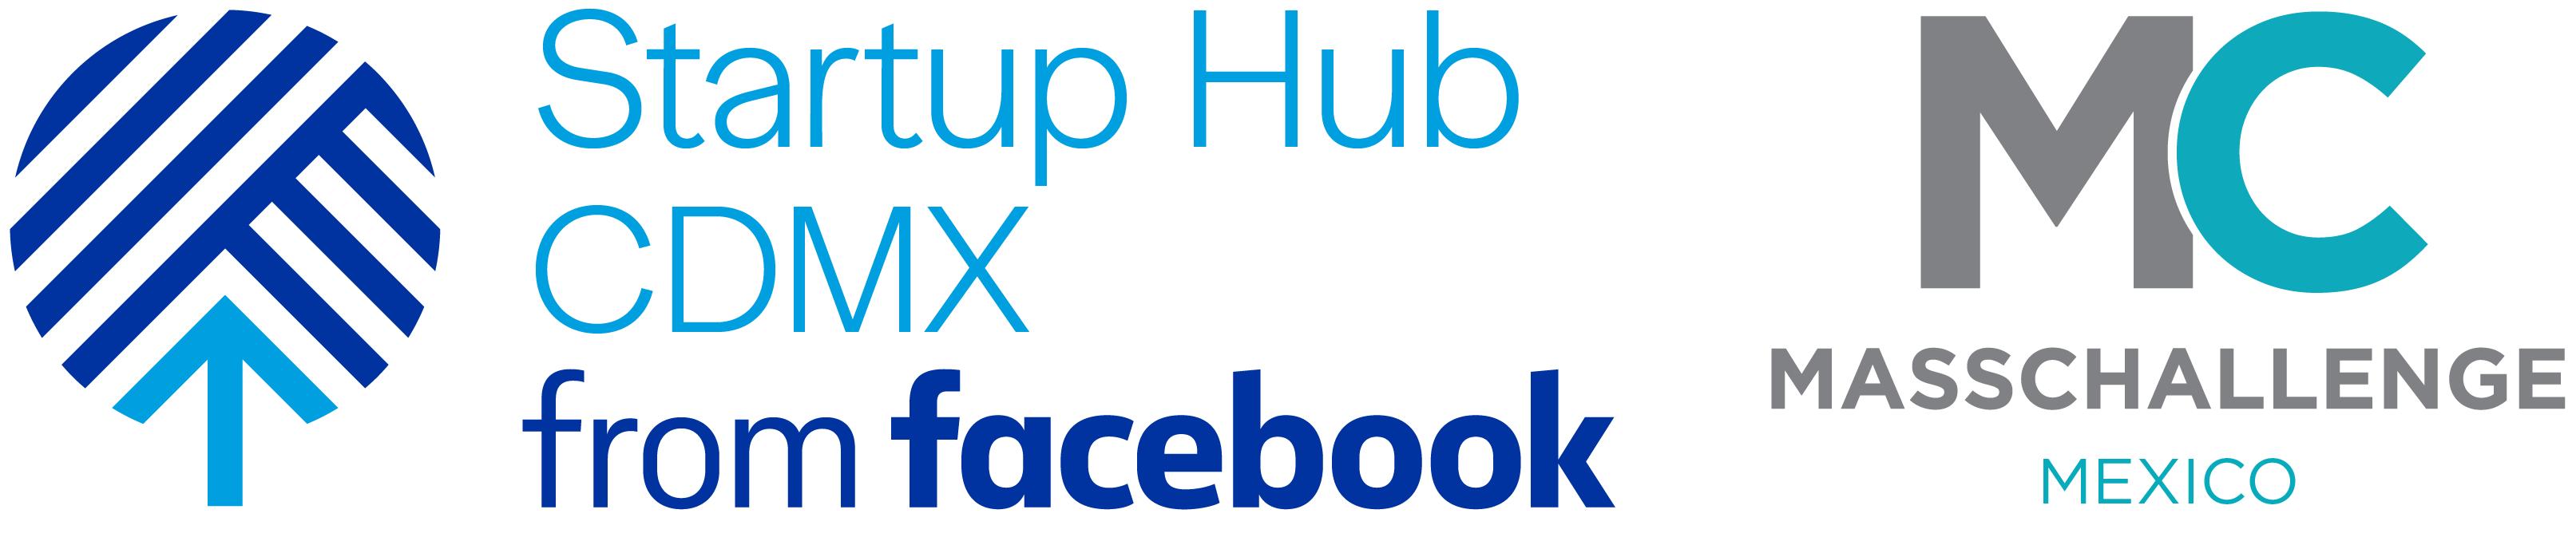 Final-Startup Hub CDMX-@4-01 copy.png